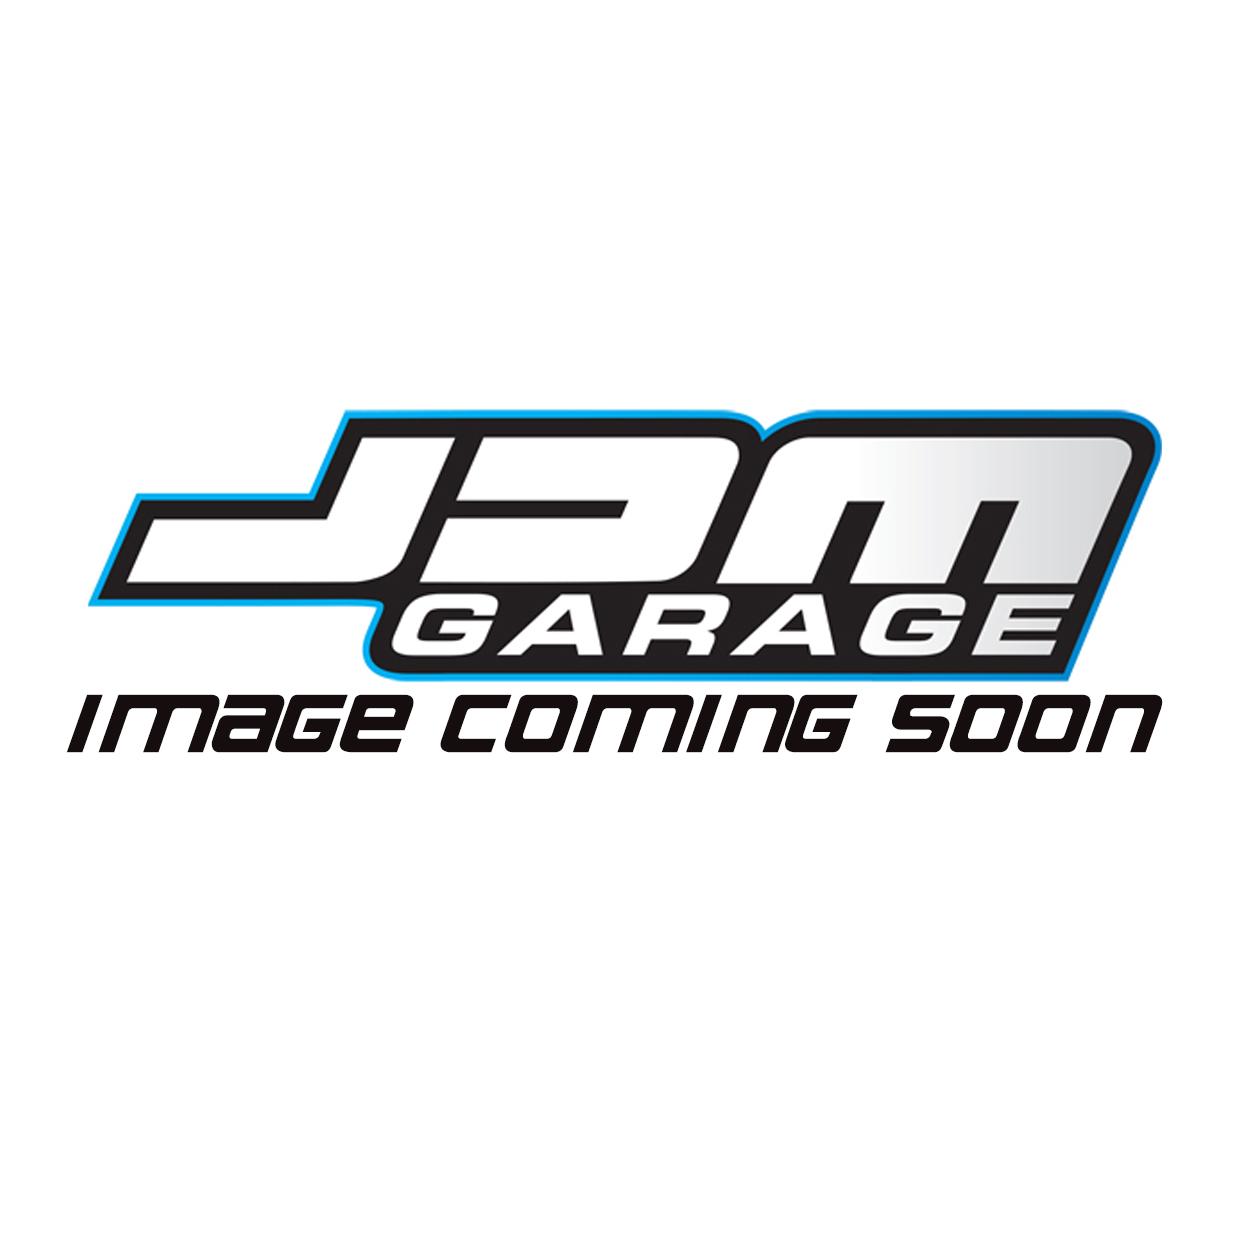 Genuine Nissan Rear Brake Pad Shim Akebono Hardware Kit For Skyline R32 R33 FairladyZ 300ZX 44080-43P25